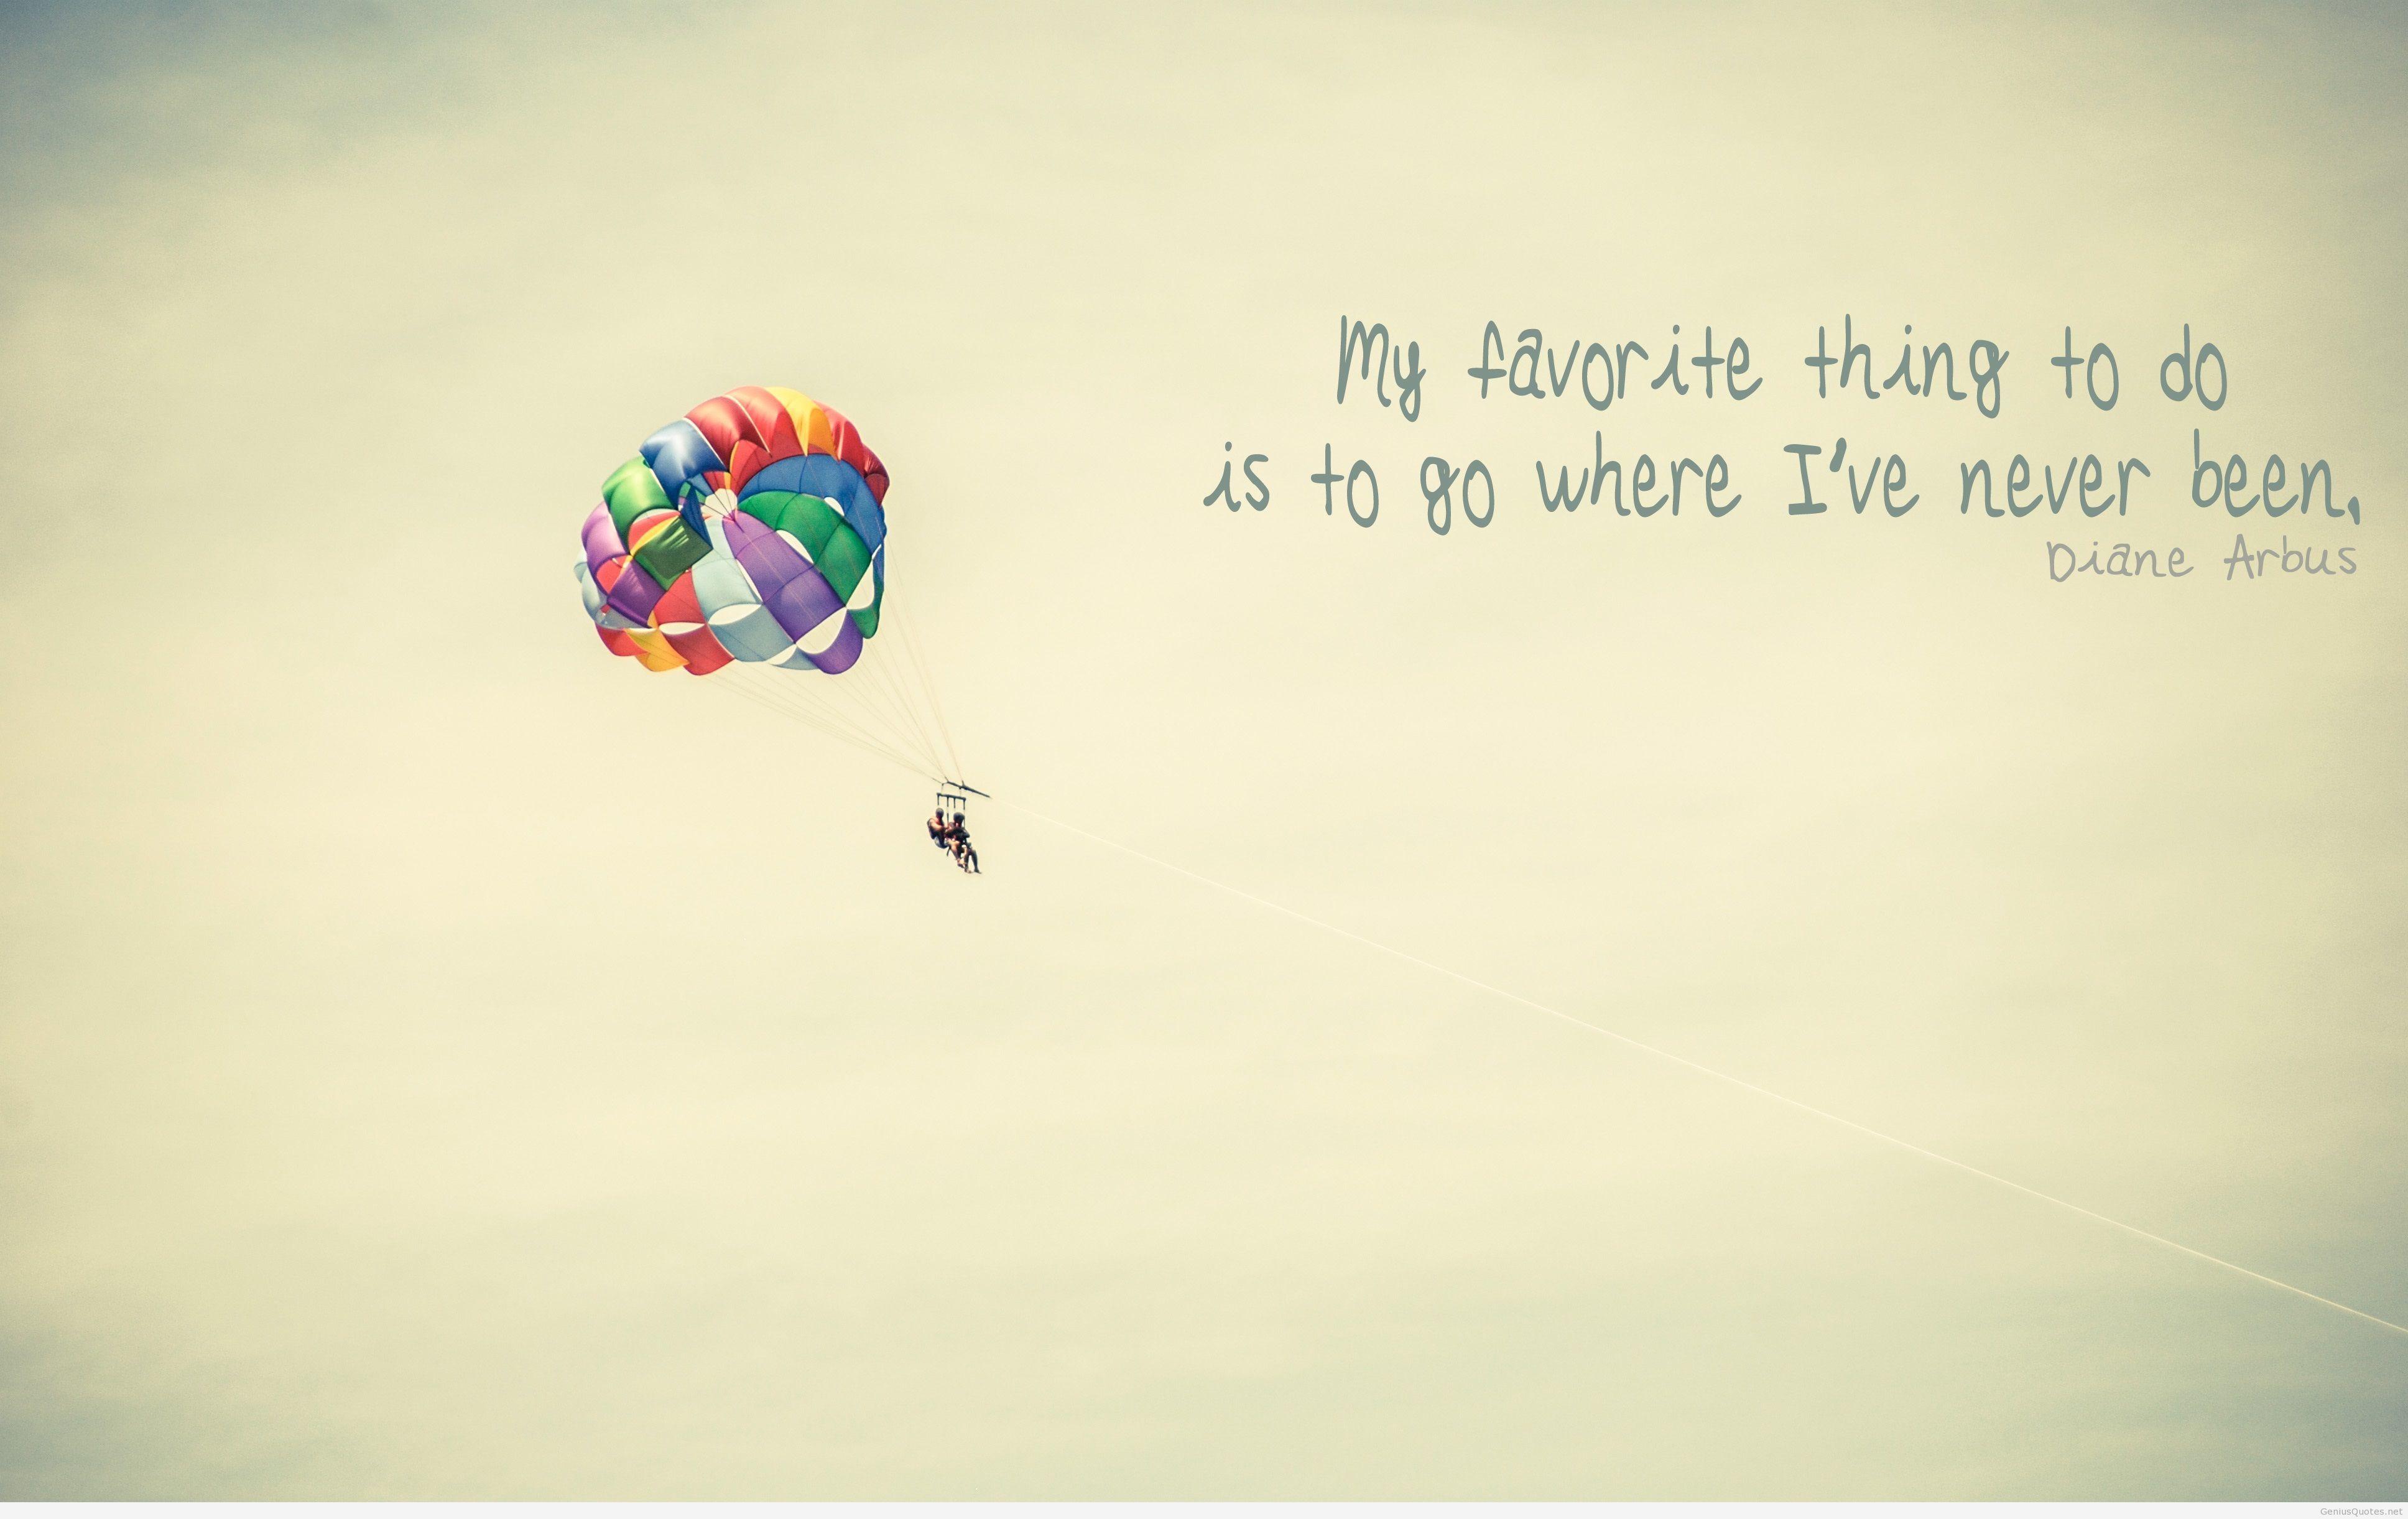 Where I've never been